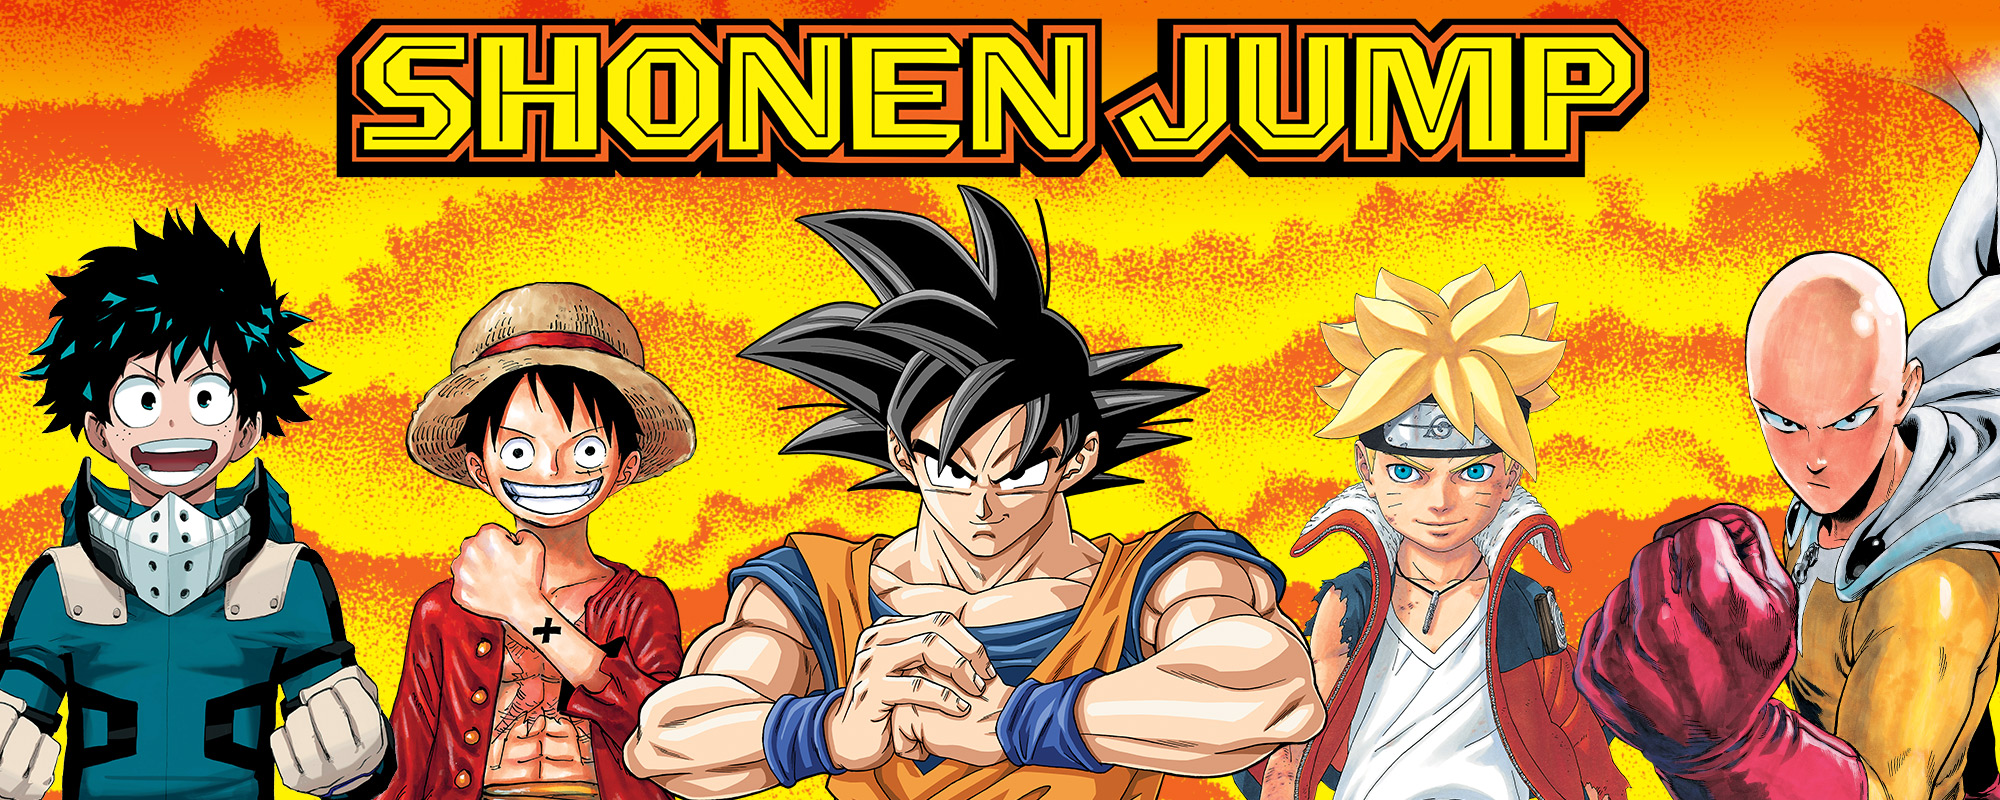 VIZ | Start Your Shonen Jump Free Trial Today!